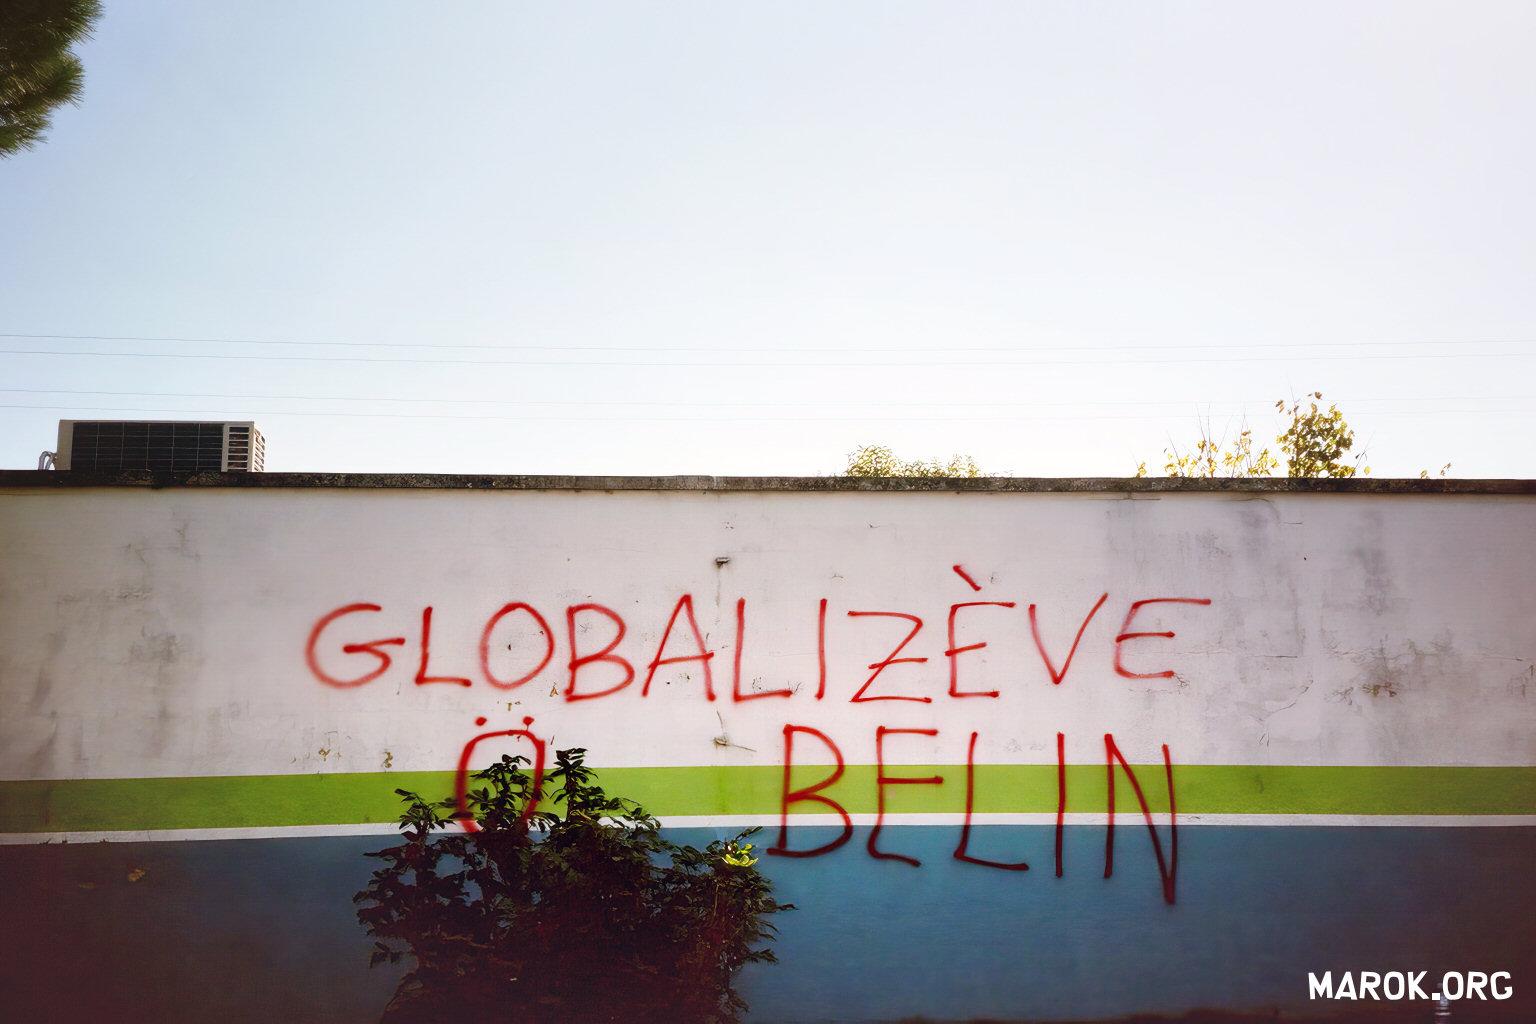 Globalizeve o belin